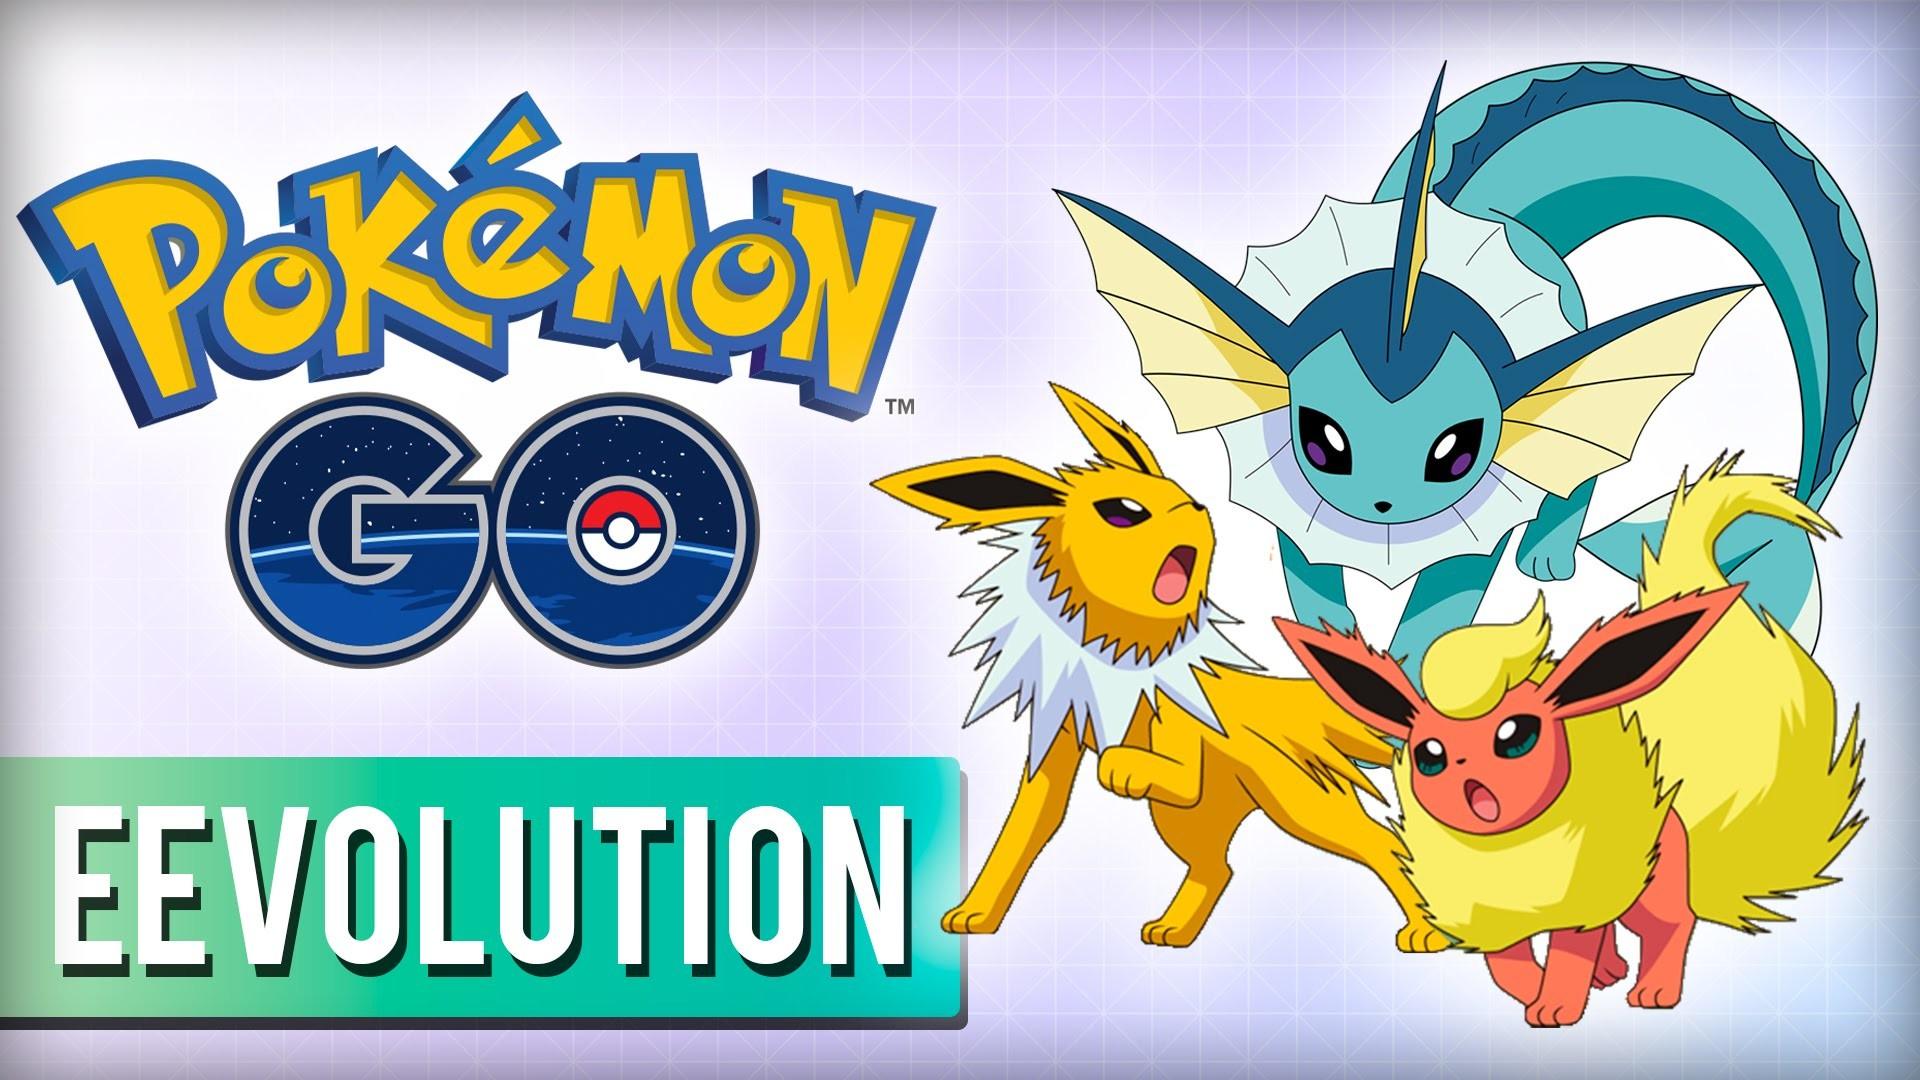 POKÉMON GO: How To CHOOSE Eevee Evolutions in Pokémon GO! (Vaporeon,  Flareon, or Jolteon!) – YouTube